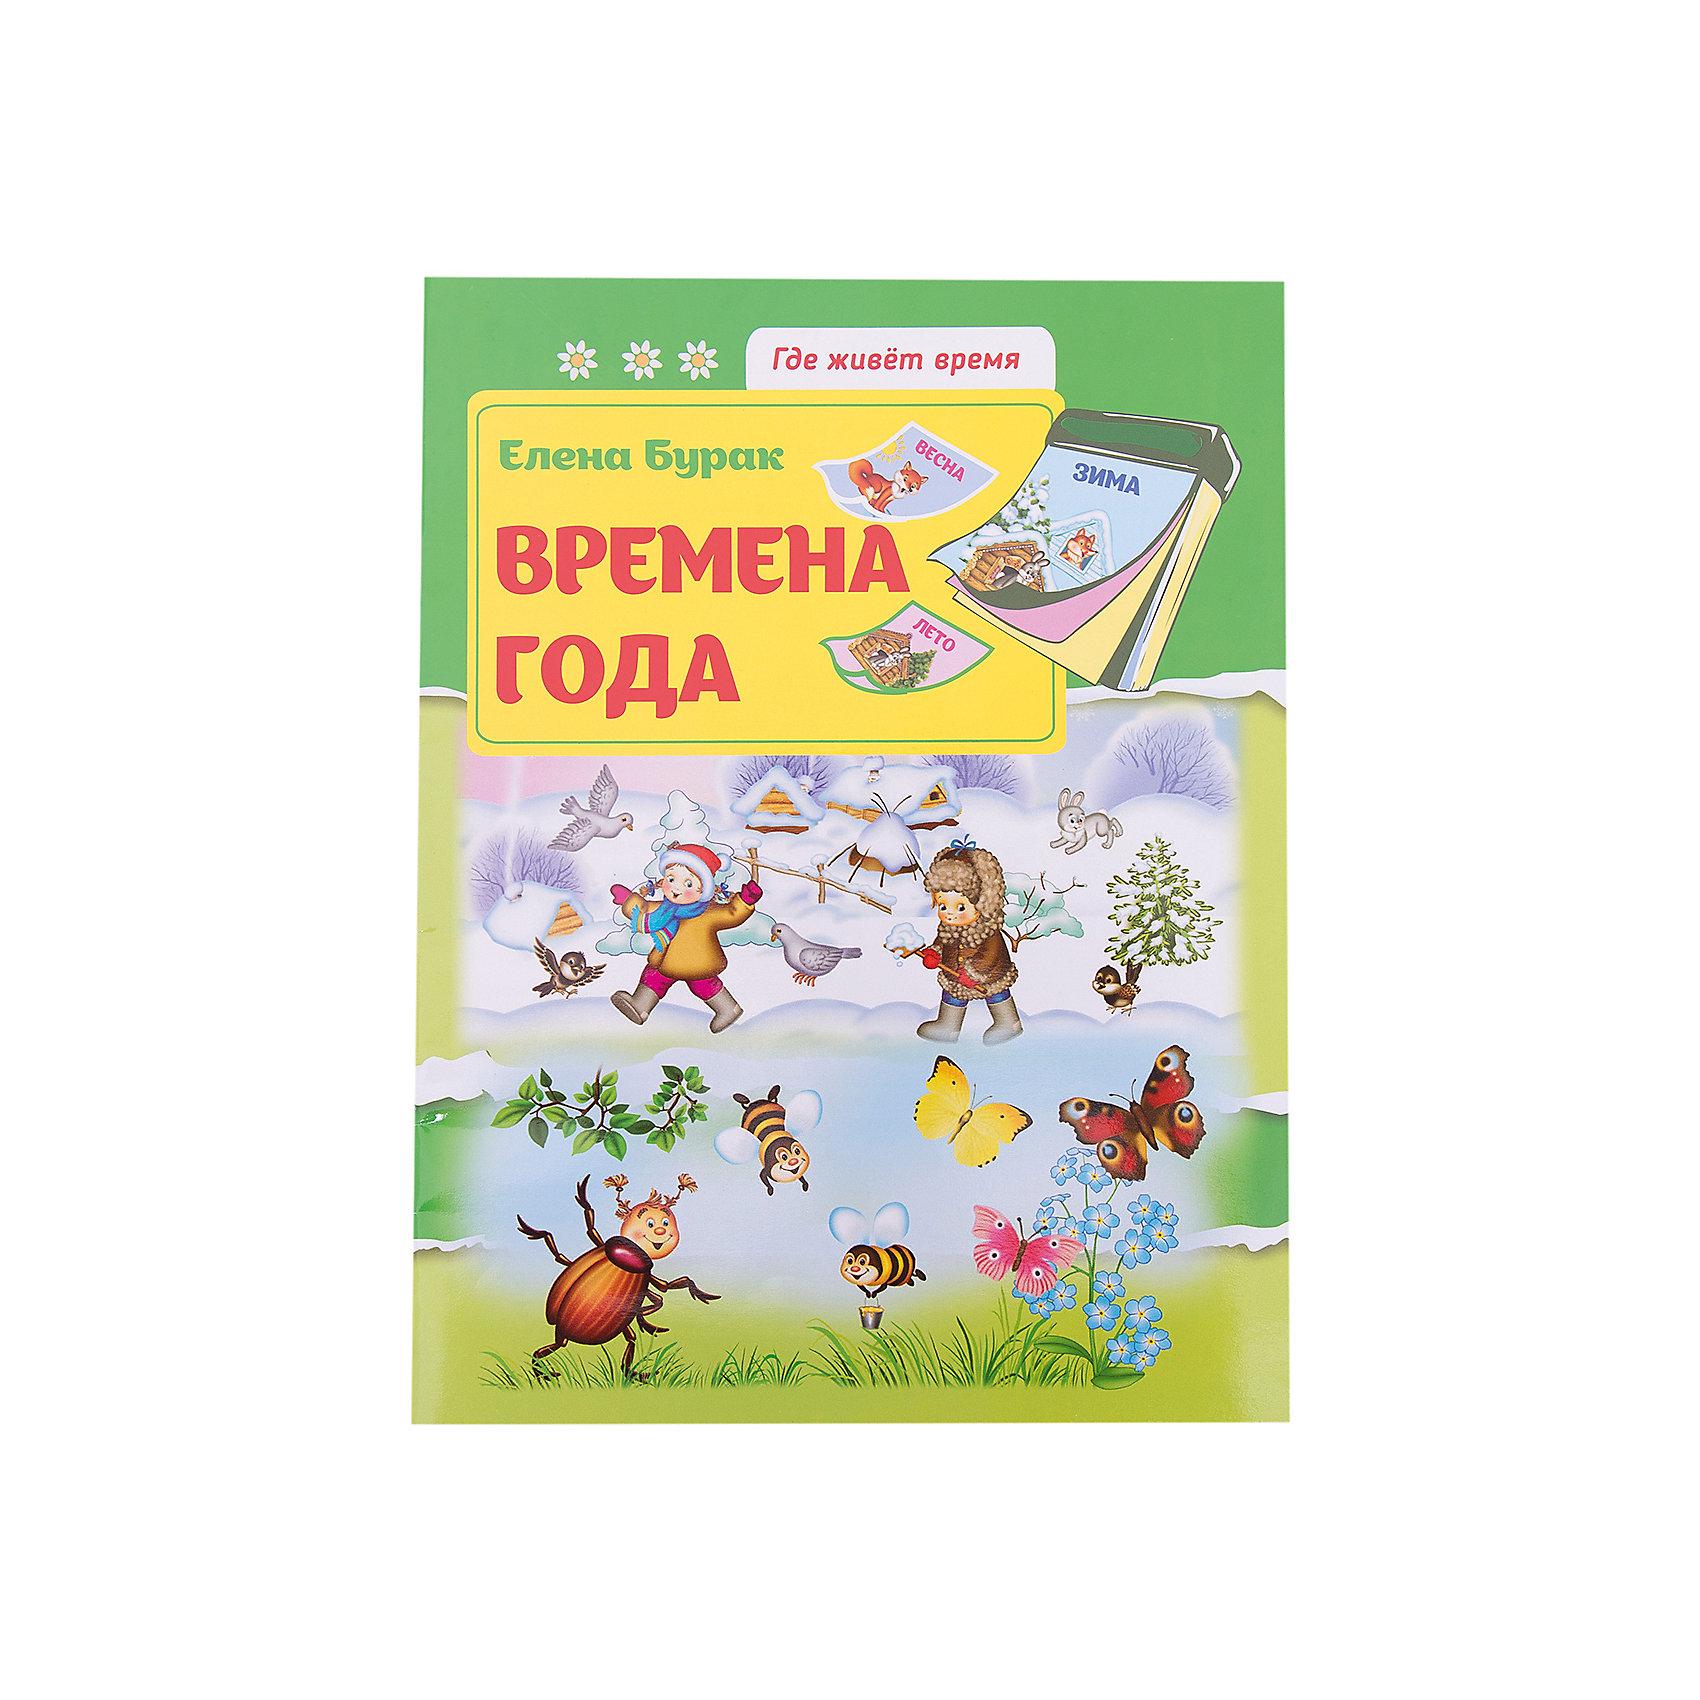 Fenix Времена года: развивающая книжка glavnye provaly 2016 goda